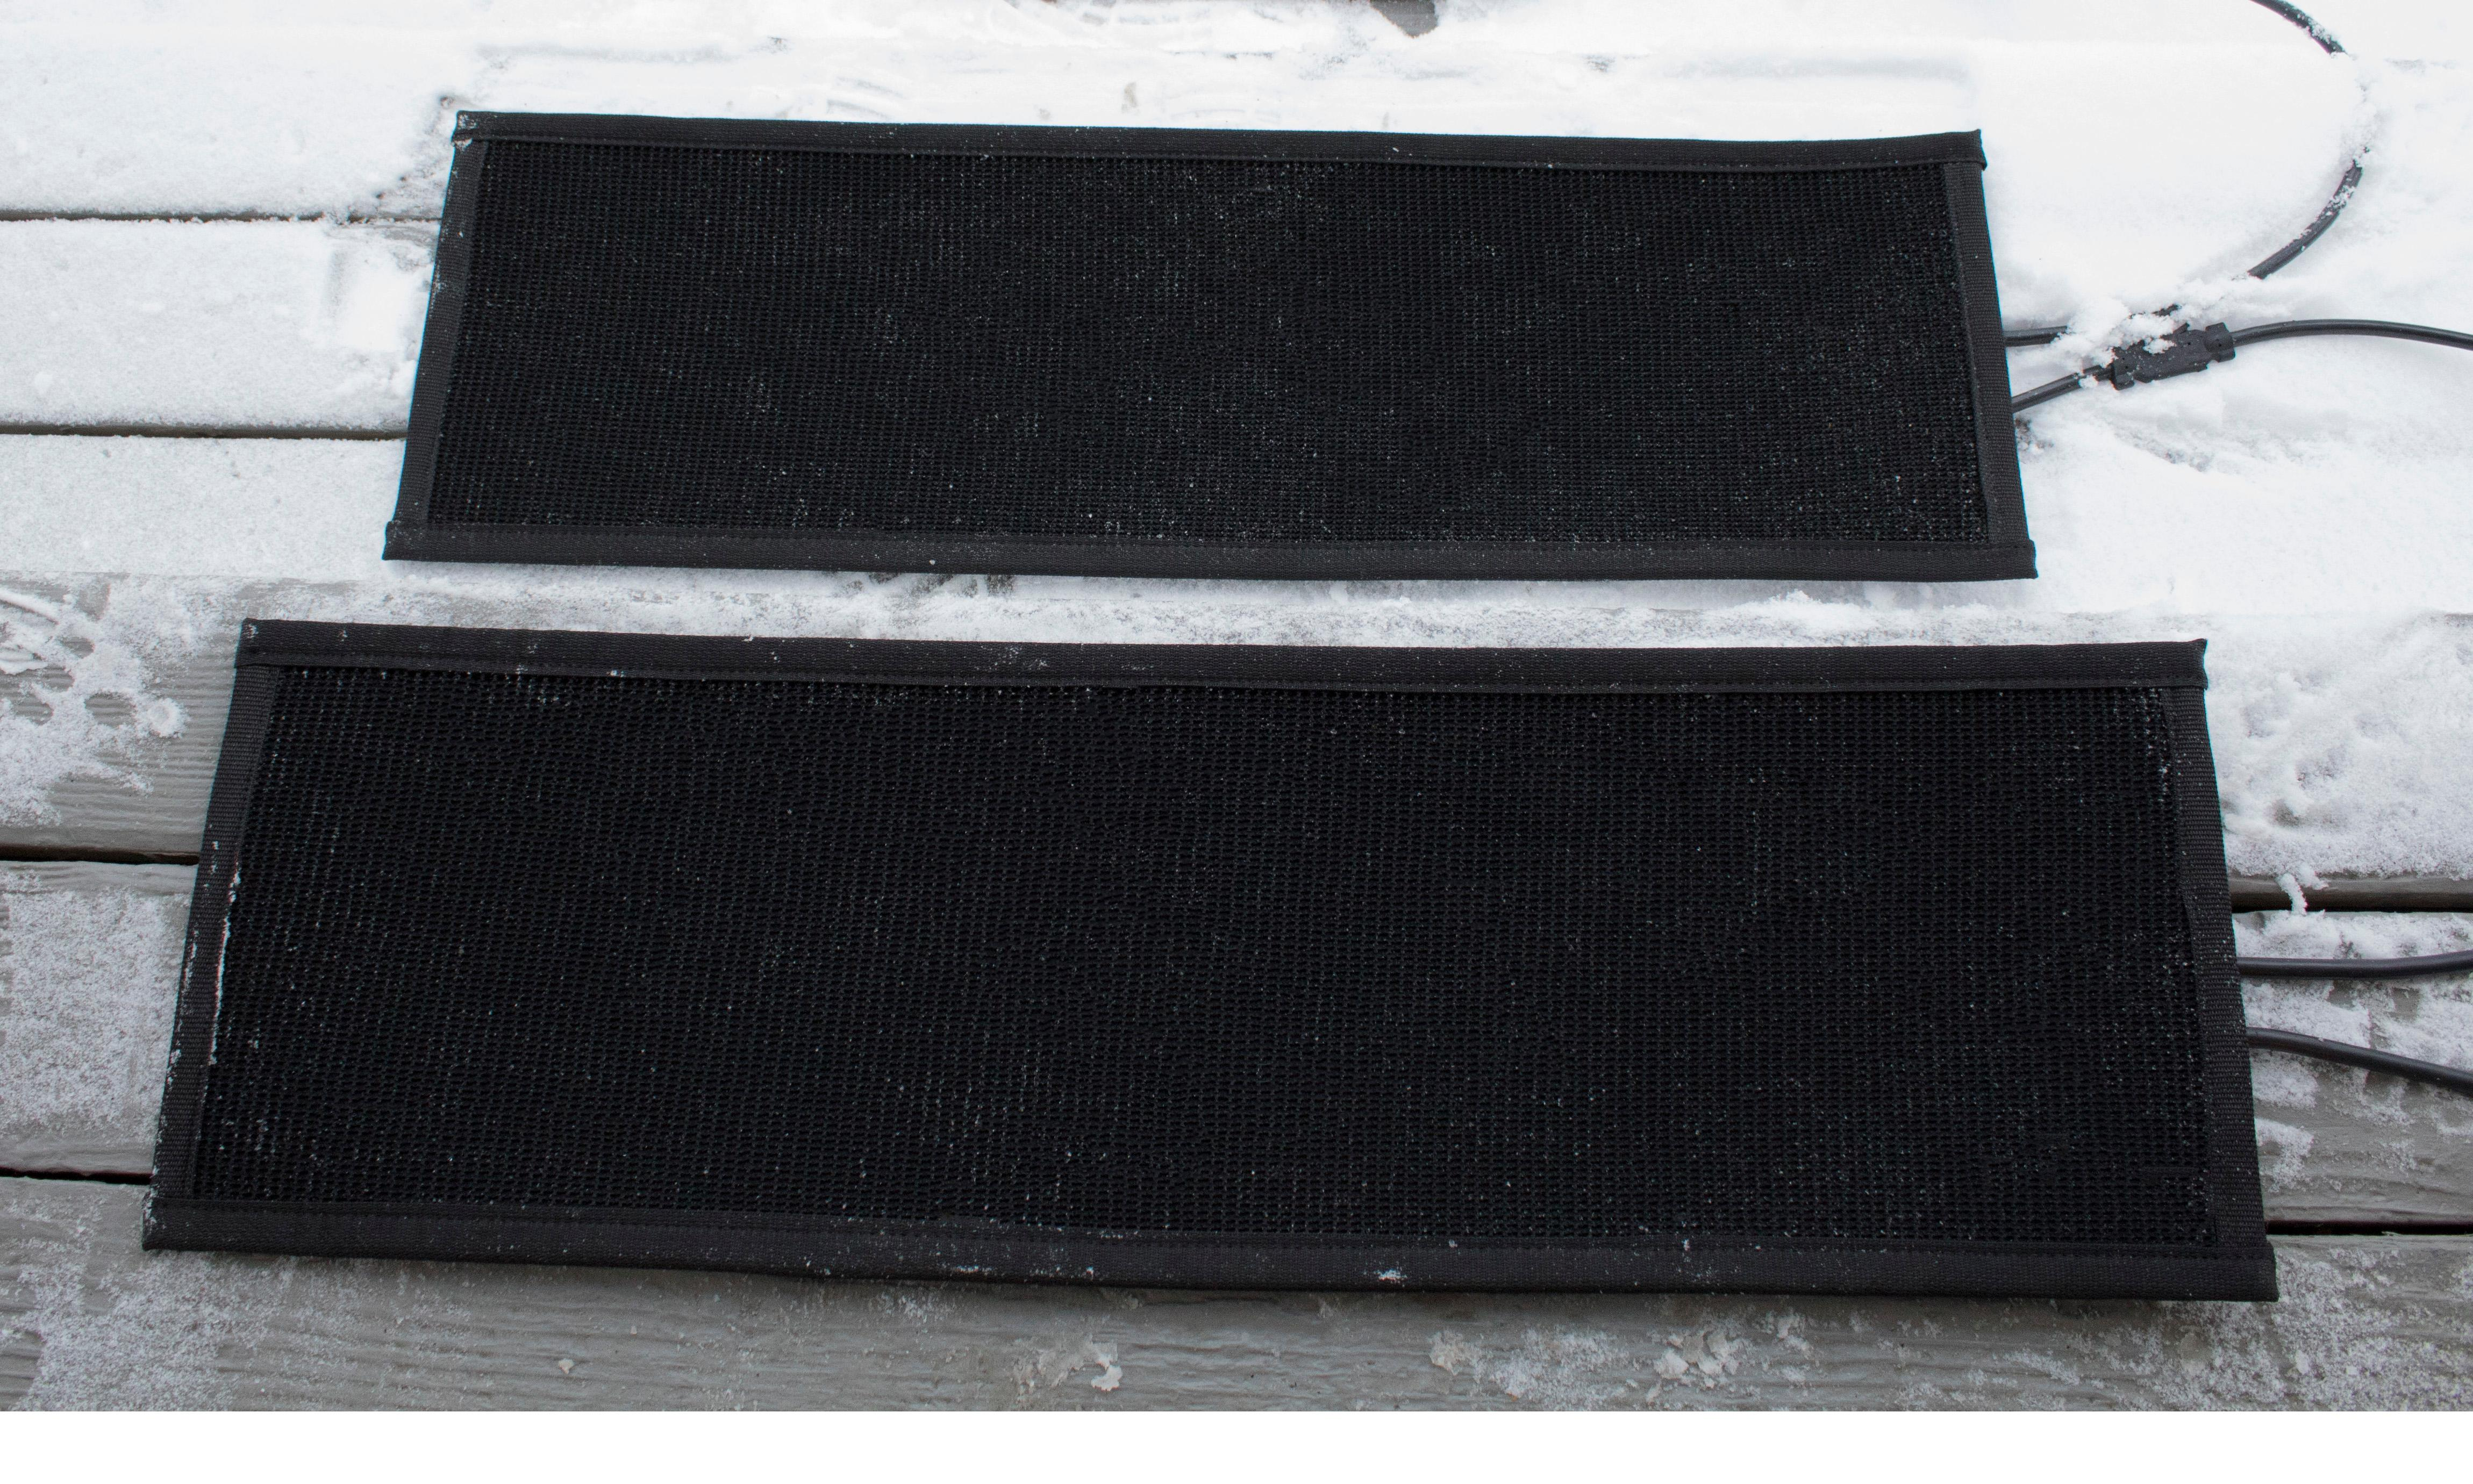 Powerblanket Wm12x120 Summerstep Snow Melting Heated